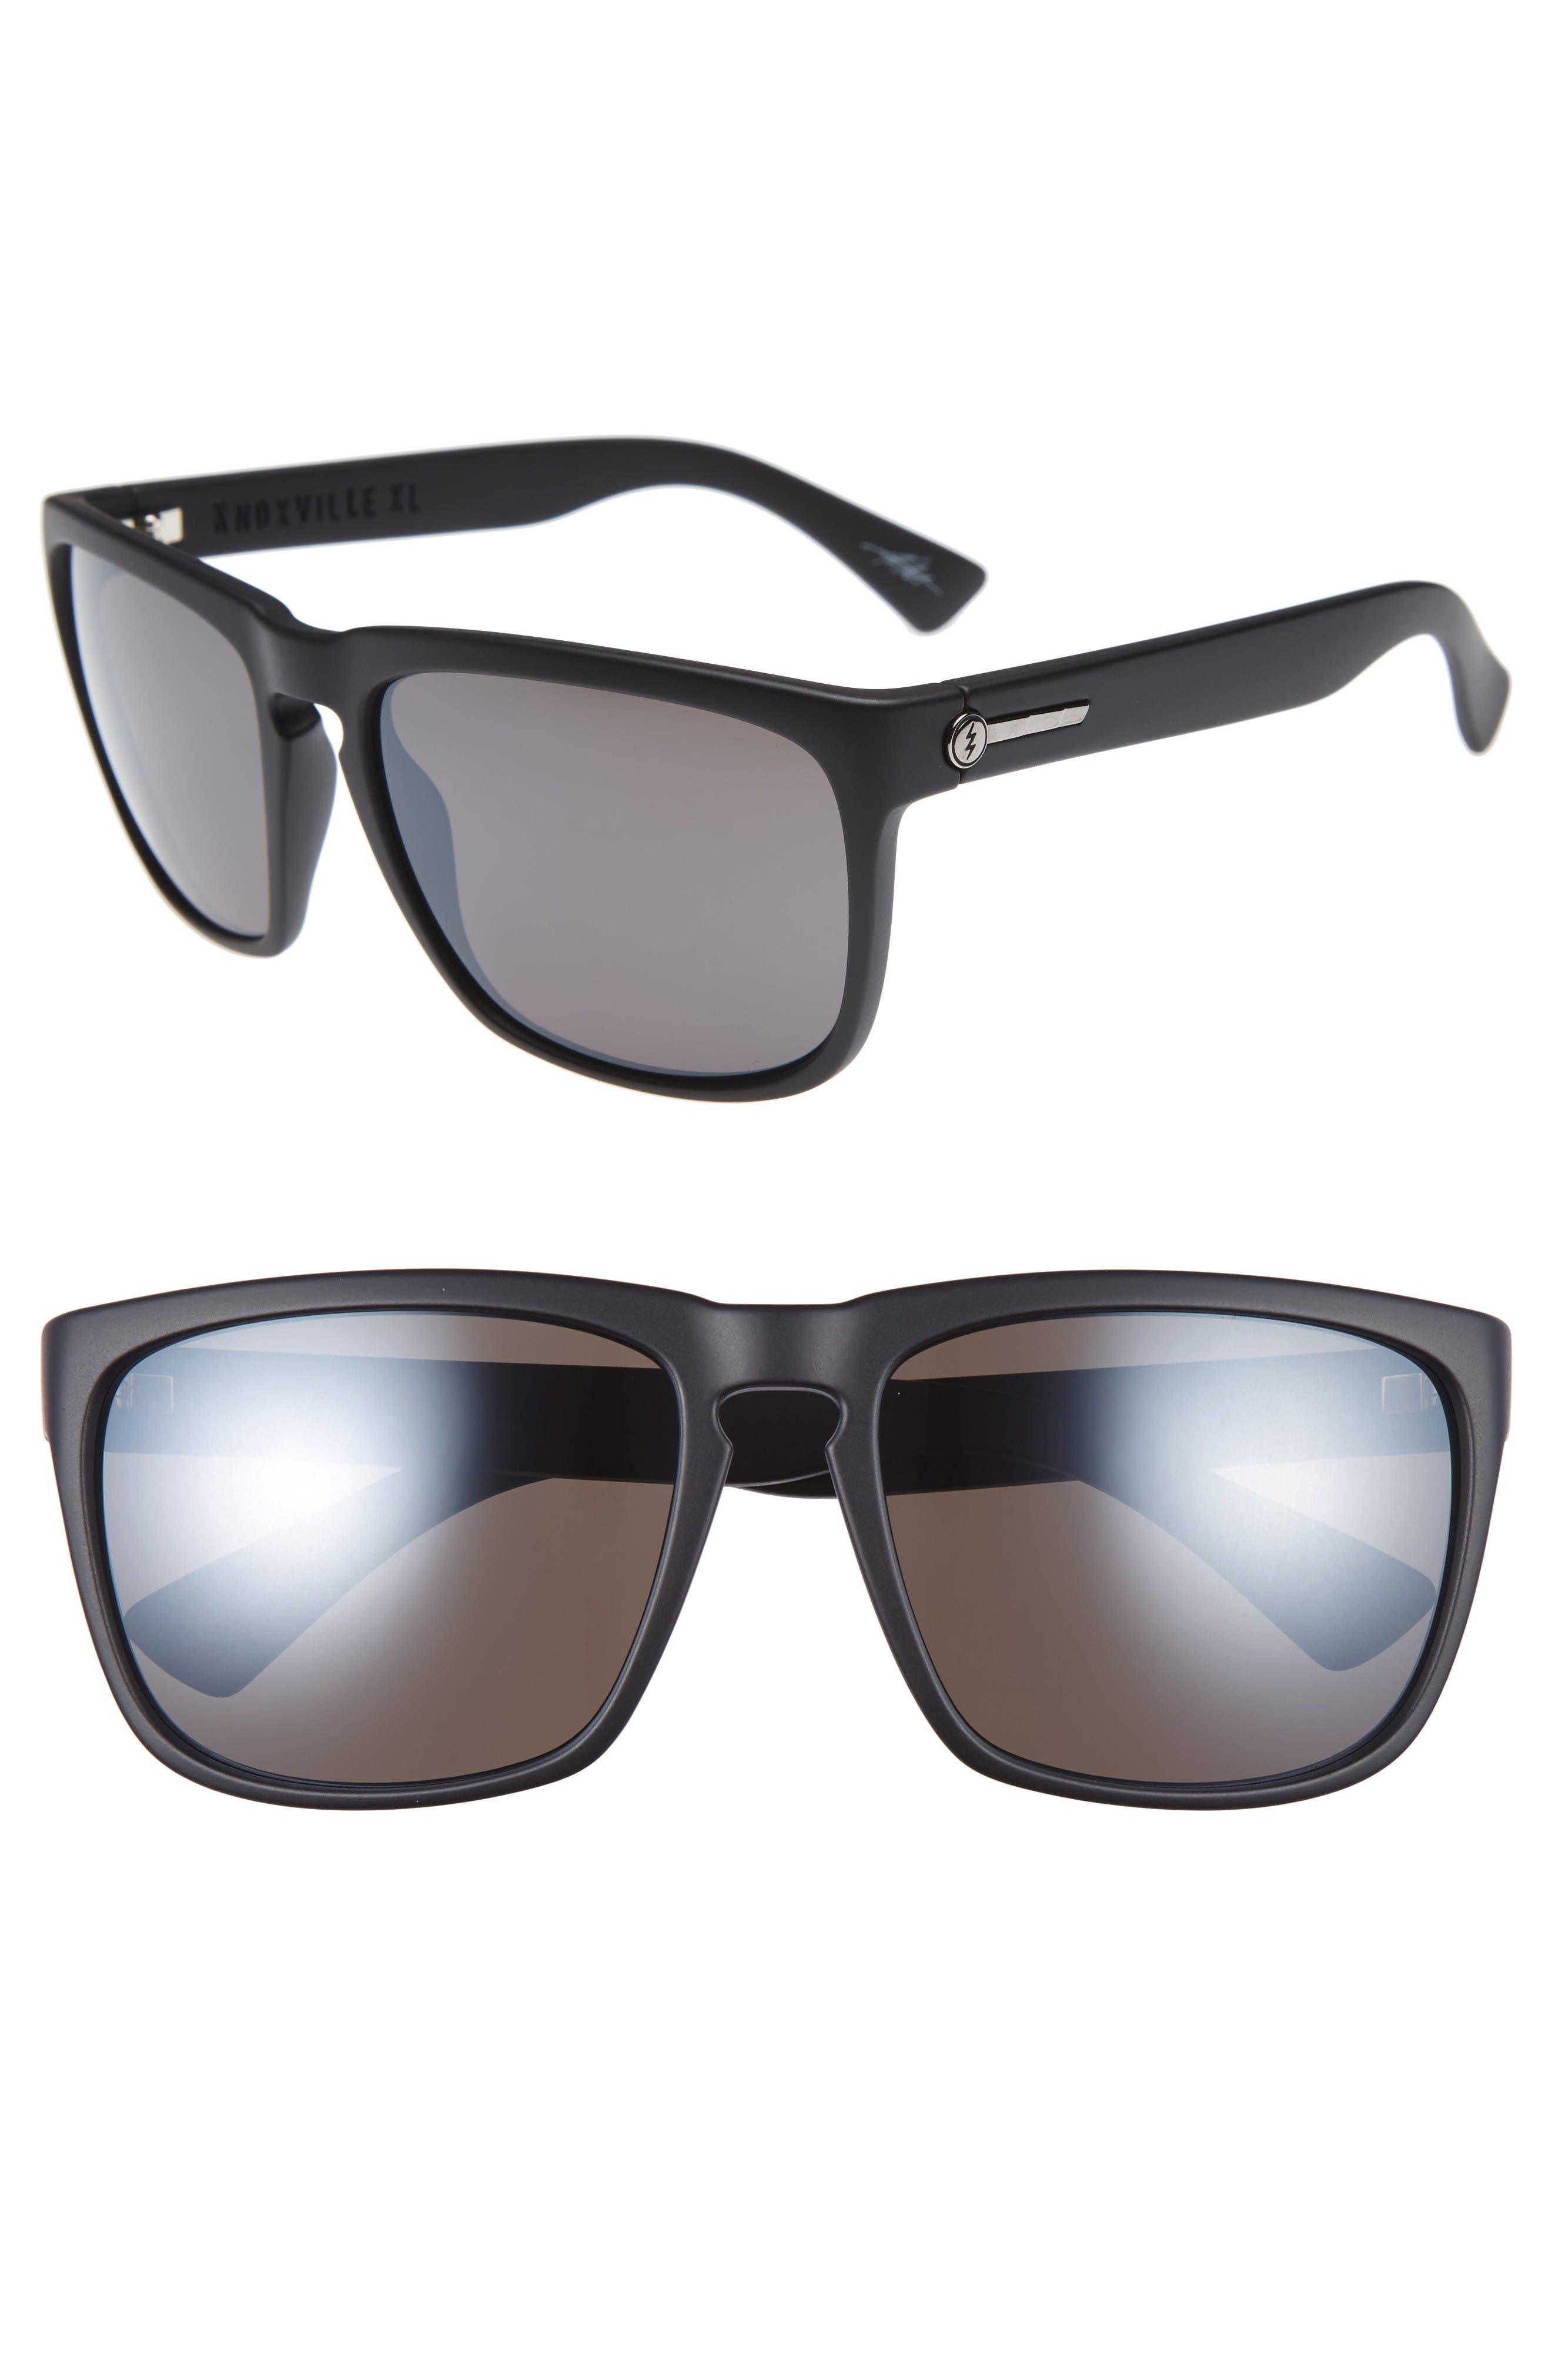 Knoxville XL 61mm Sunglasses,                         Main,                         color, Dark Chrome/ Silver Chrome